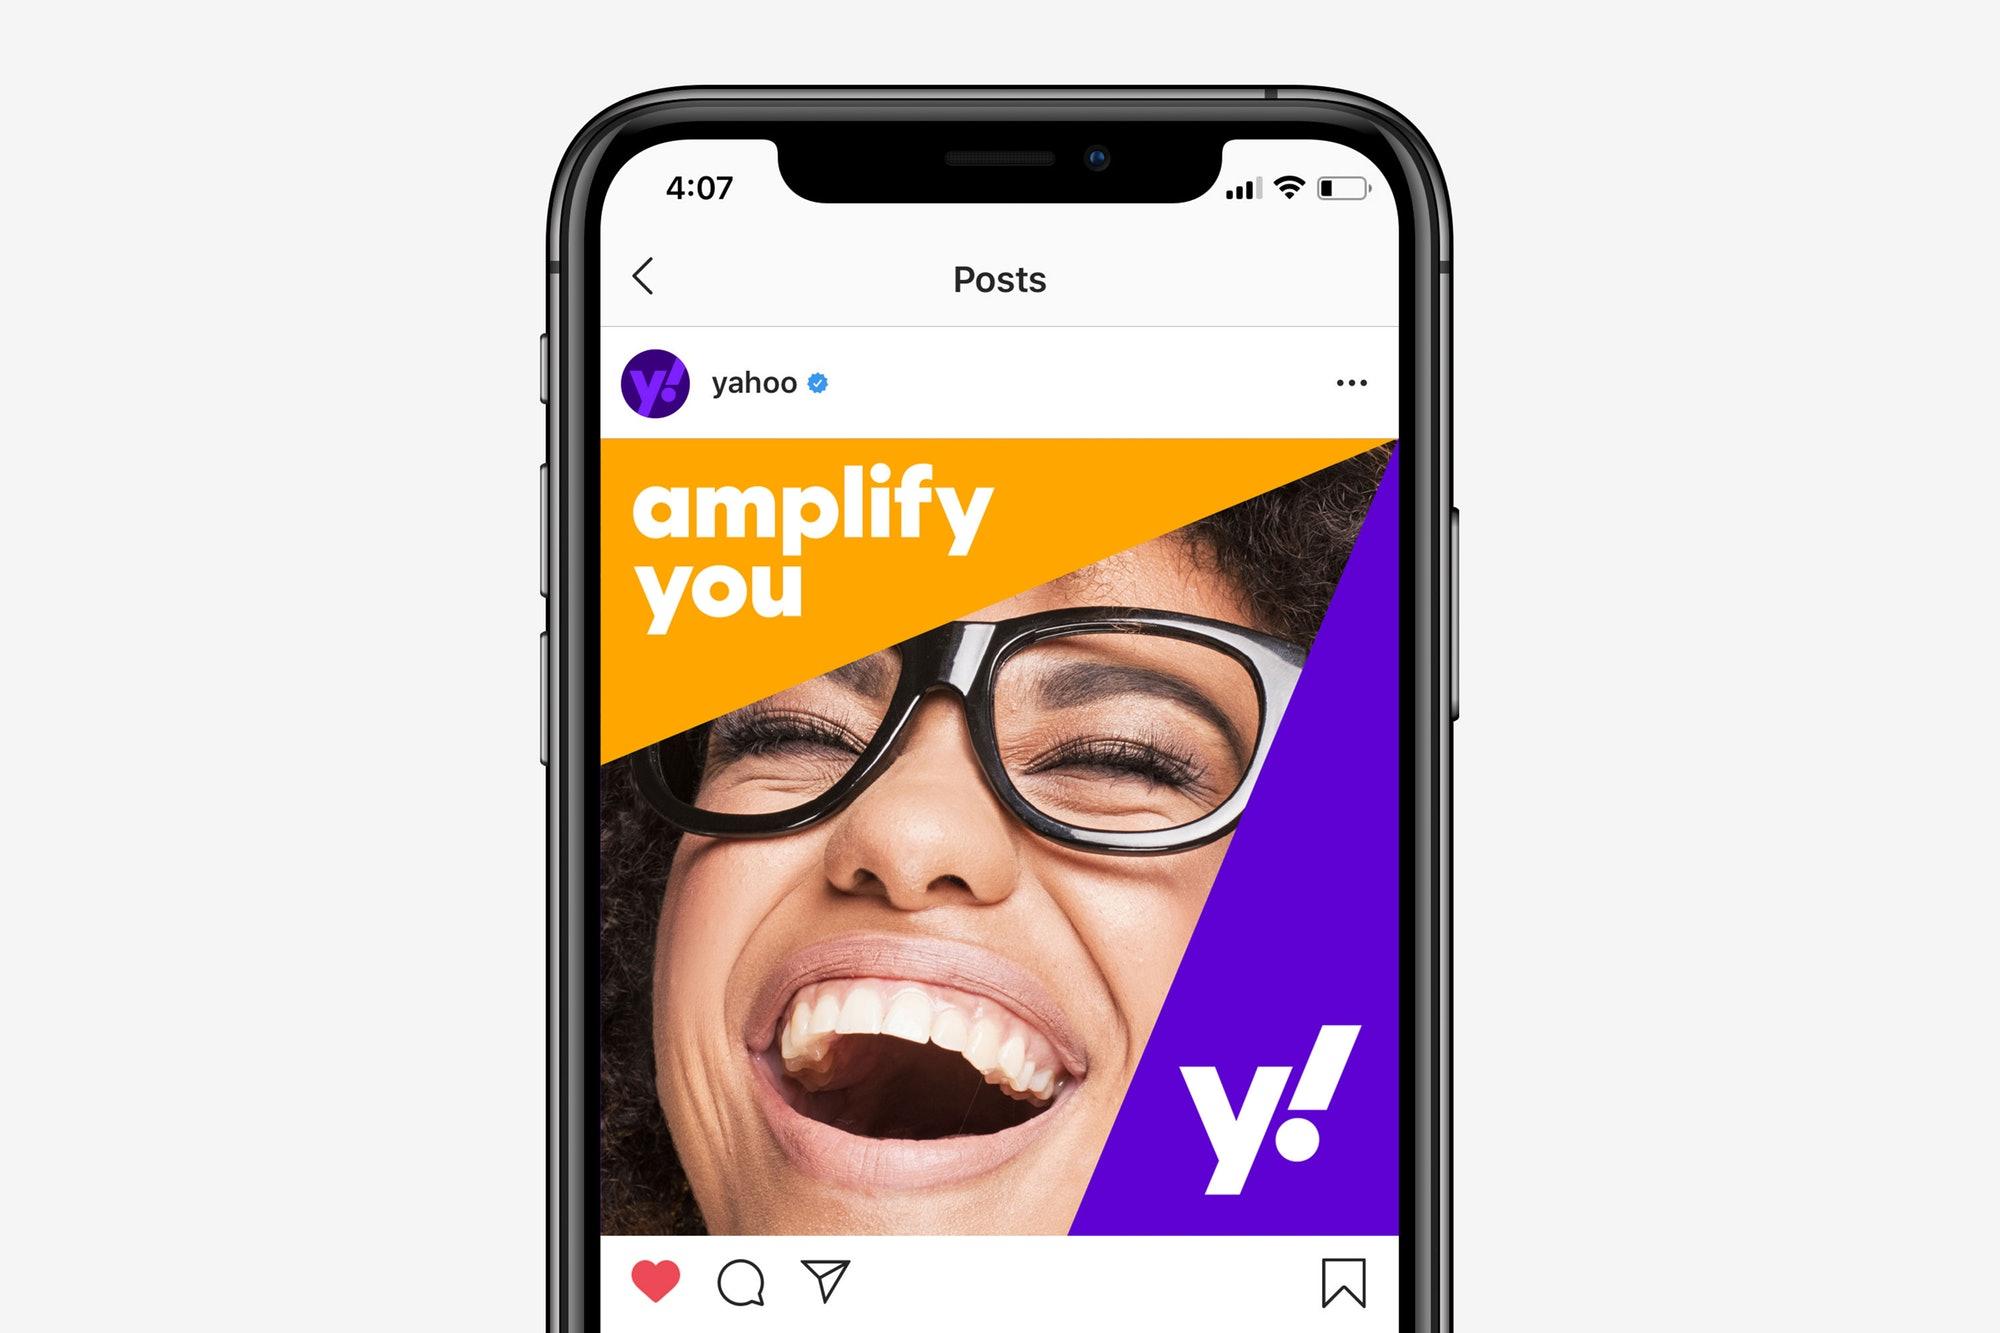 nowe logo yahoo! w social media